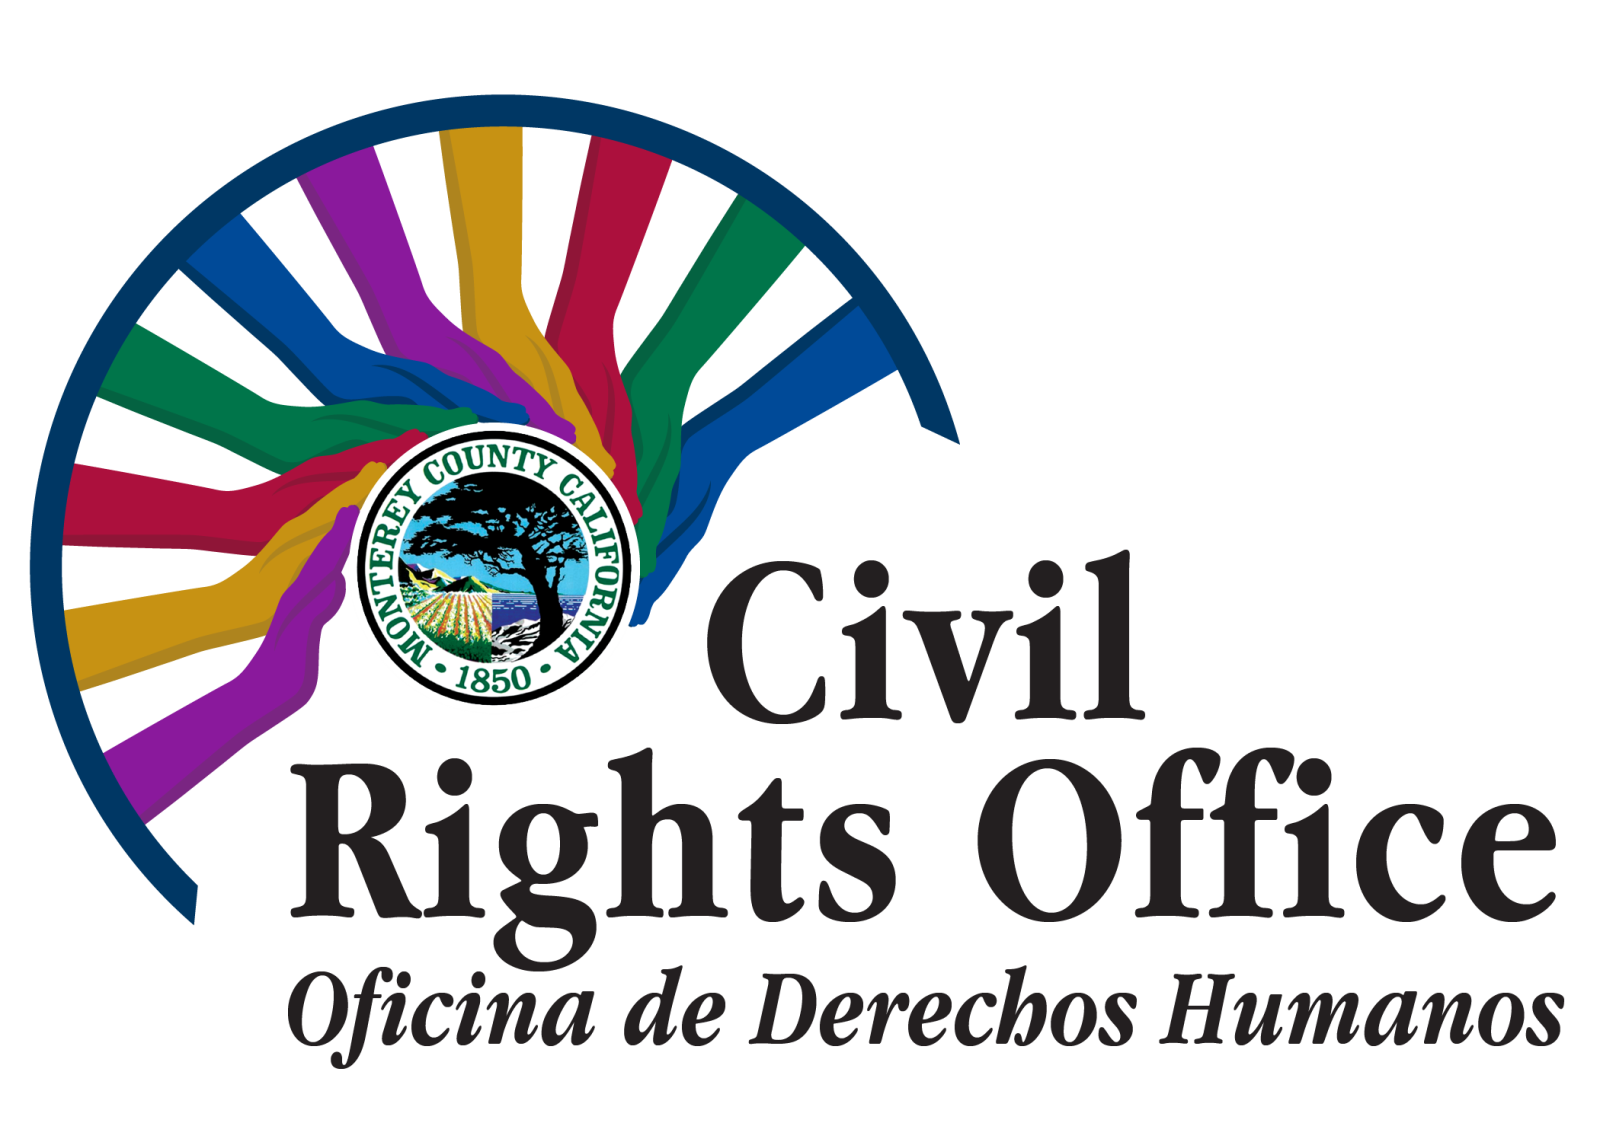 Civil Rights Office Logo